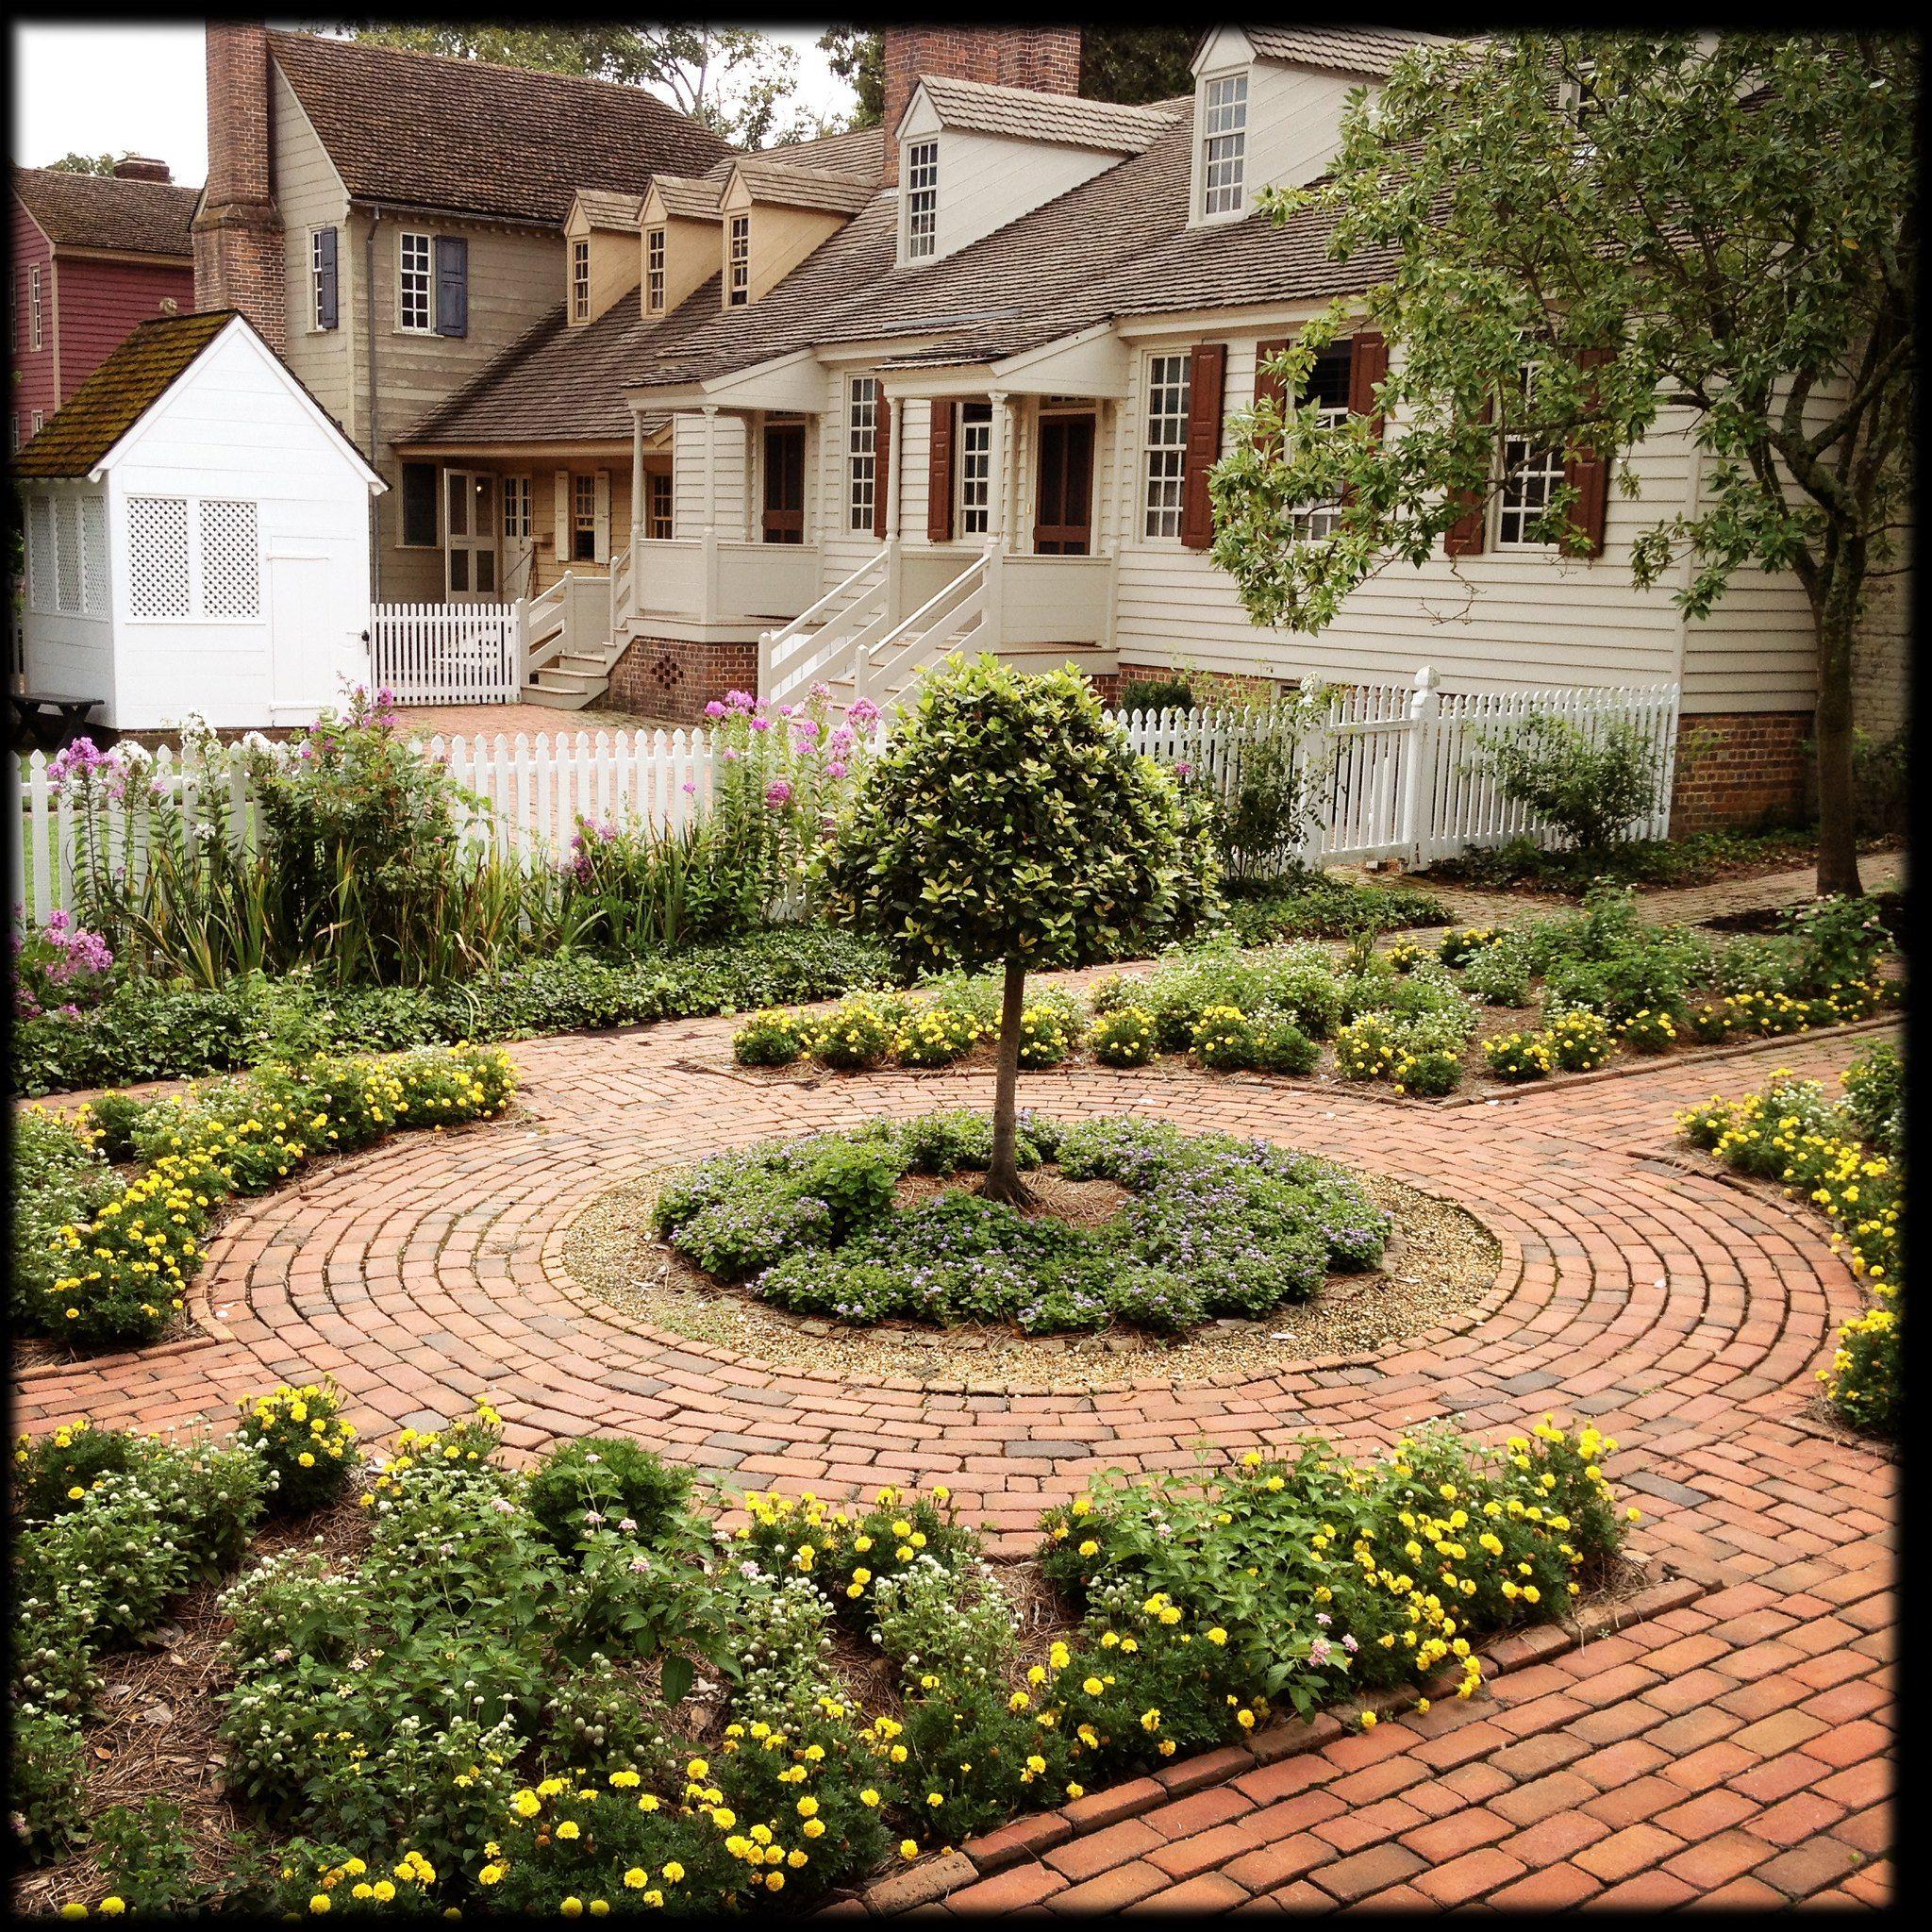 Colonial Williamsburg Virginia History Img 9593 In 2020 Colonial Garden Colonial Williamsburg Virginia Williamsburg Virginia